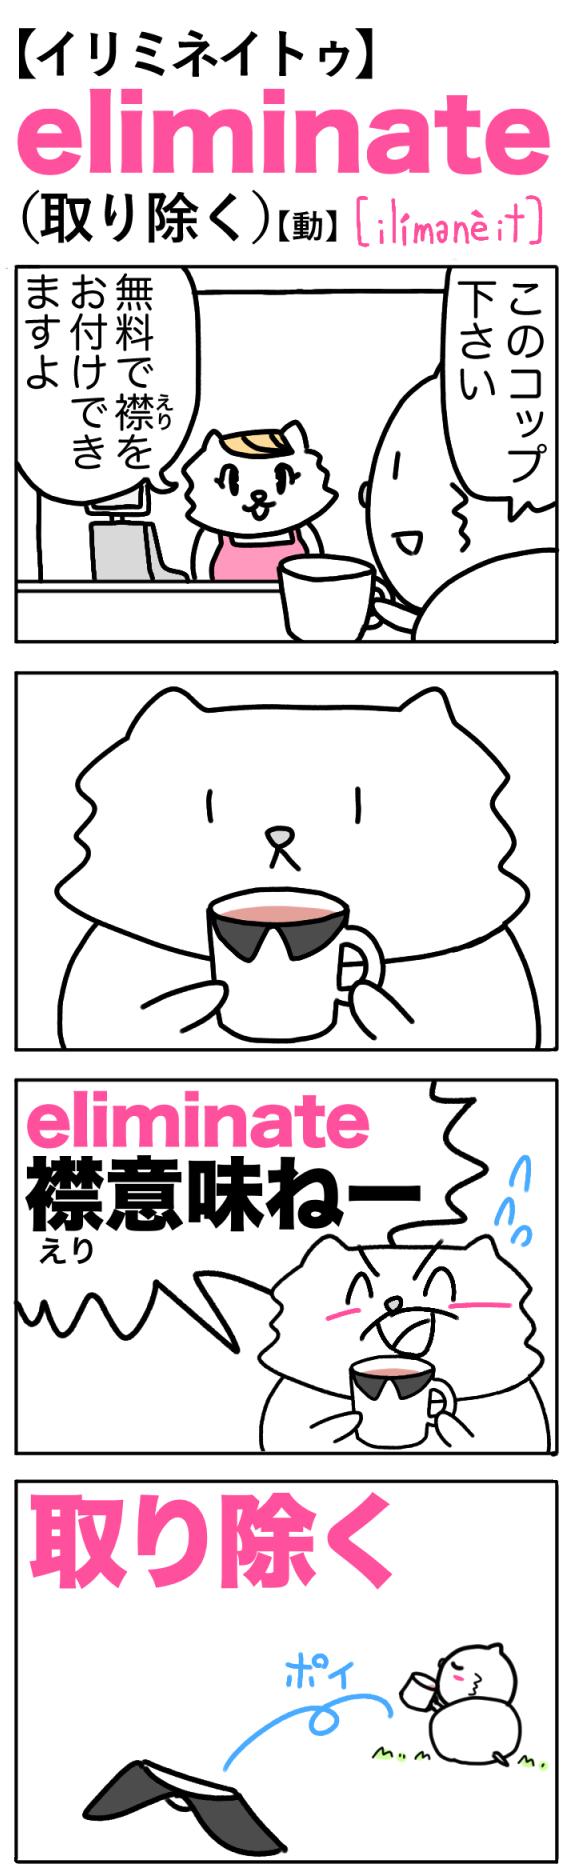 eliminate(取り除く)の語呂合わせ英単語